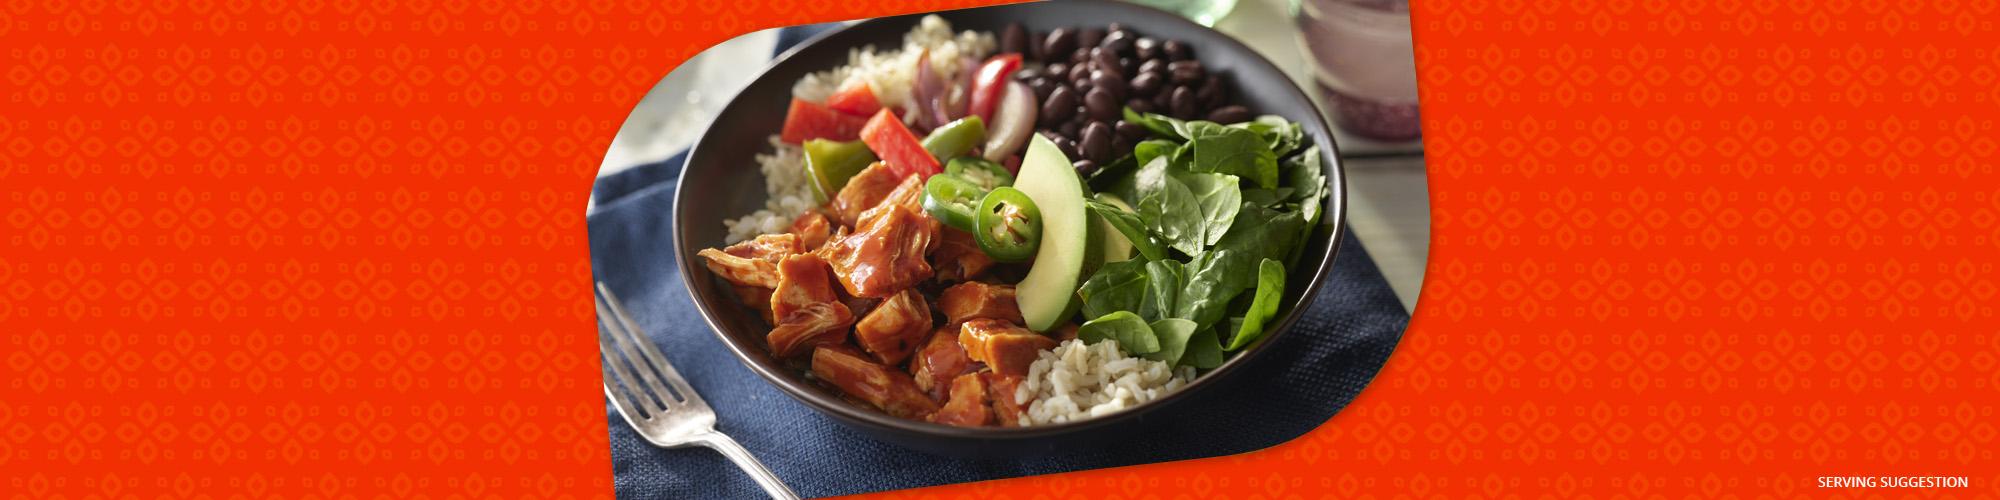 Salsas enchilada brown rice bowl